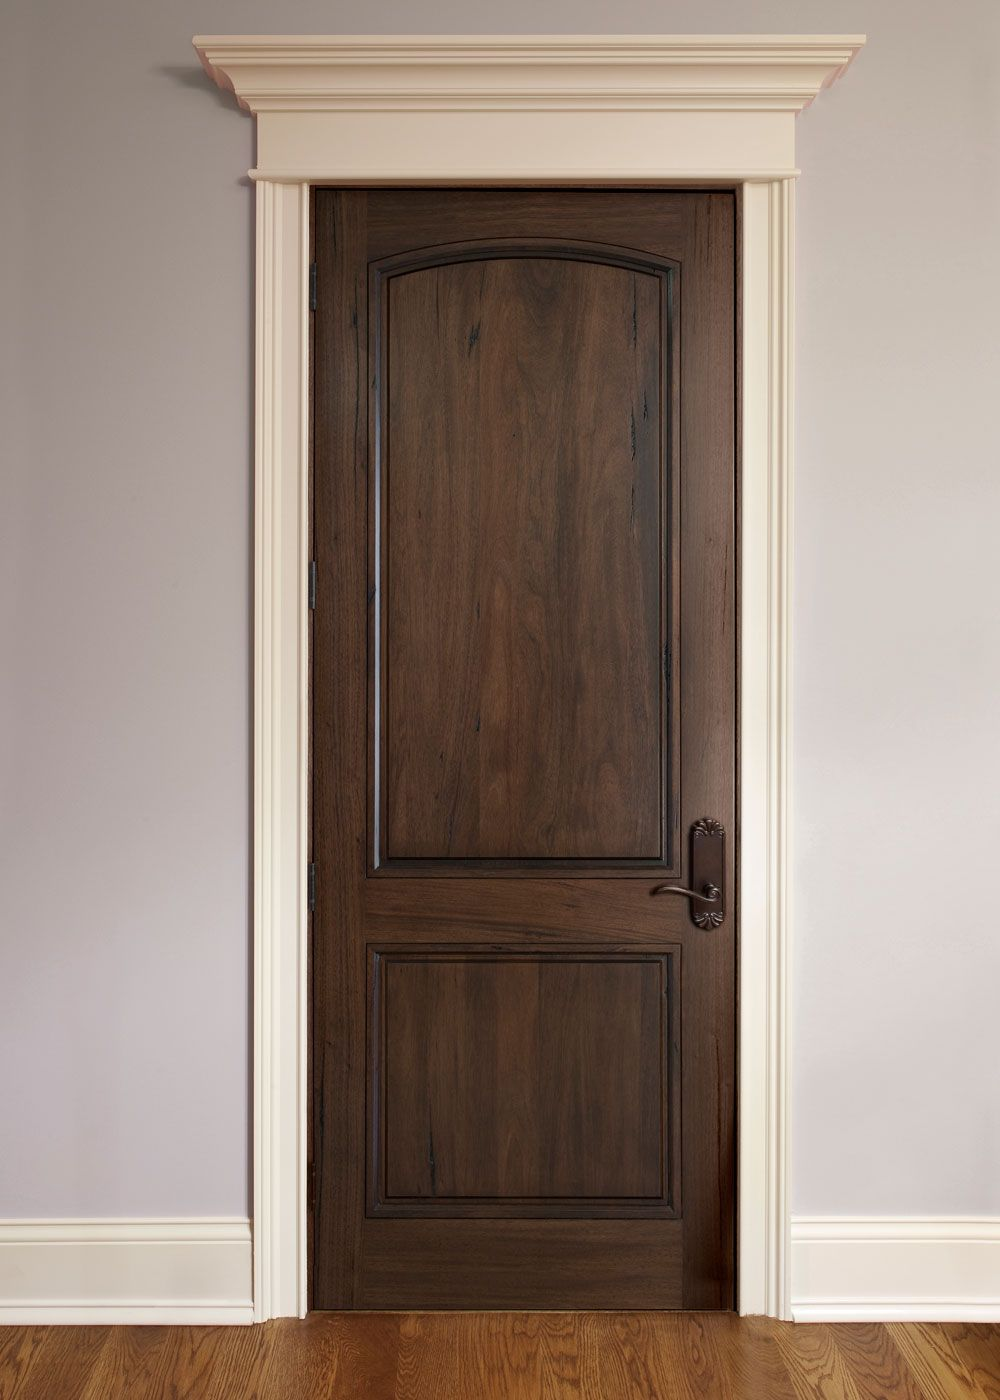 Interior Door Custom Single Solid Wood With American Walnut